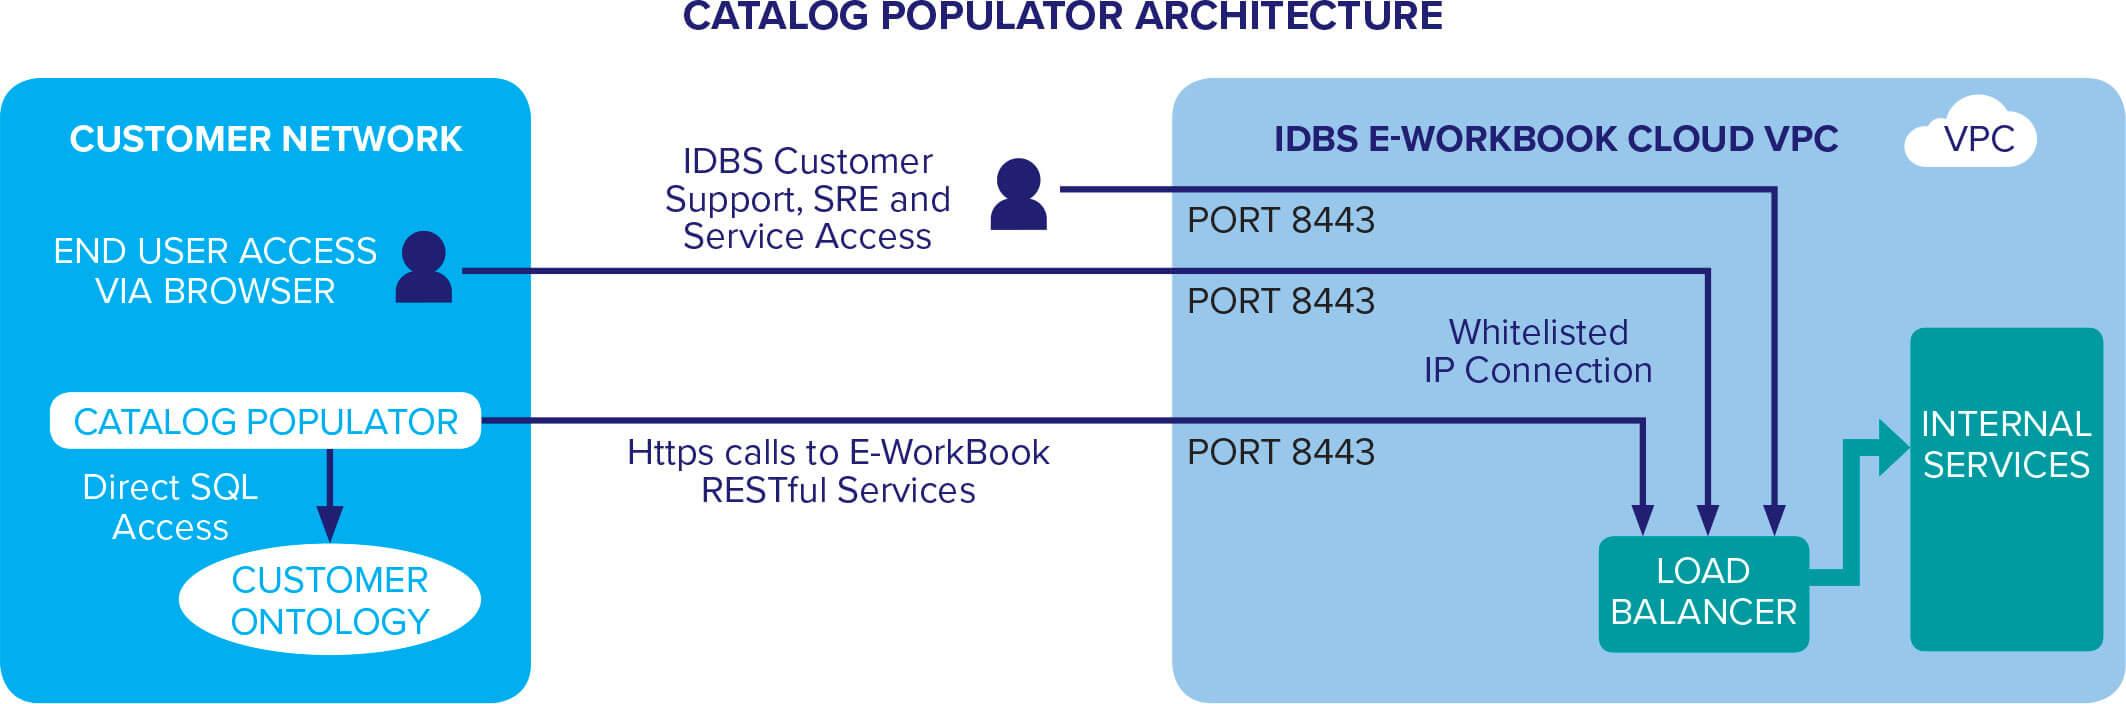 catalog populator architecture